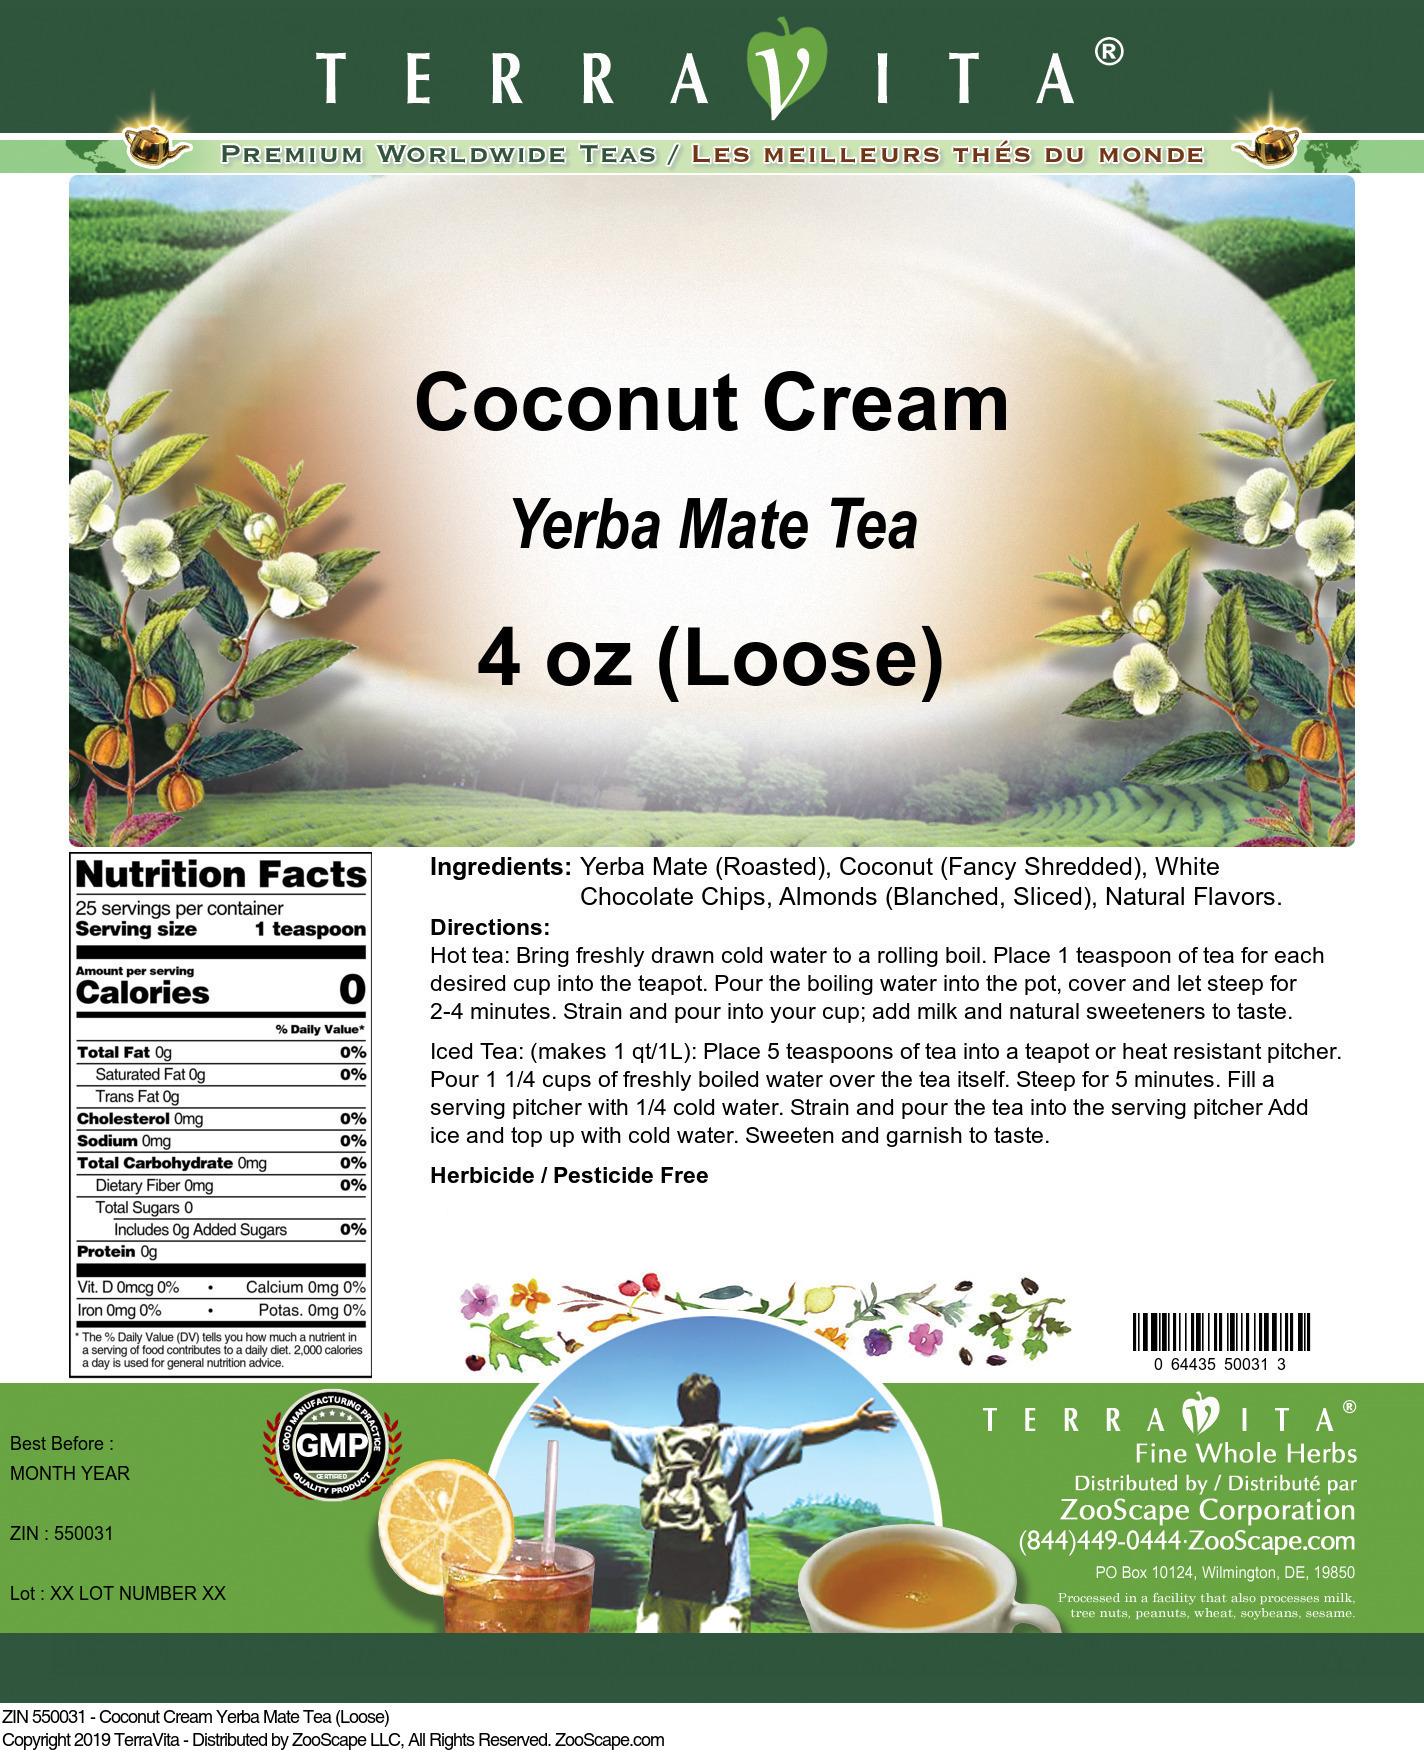 Coconut Cream Yerba Mate